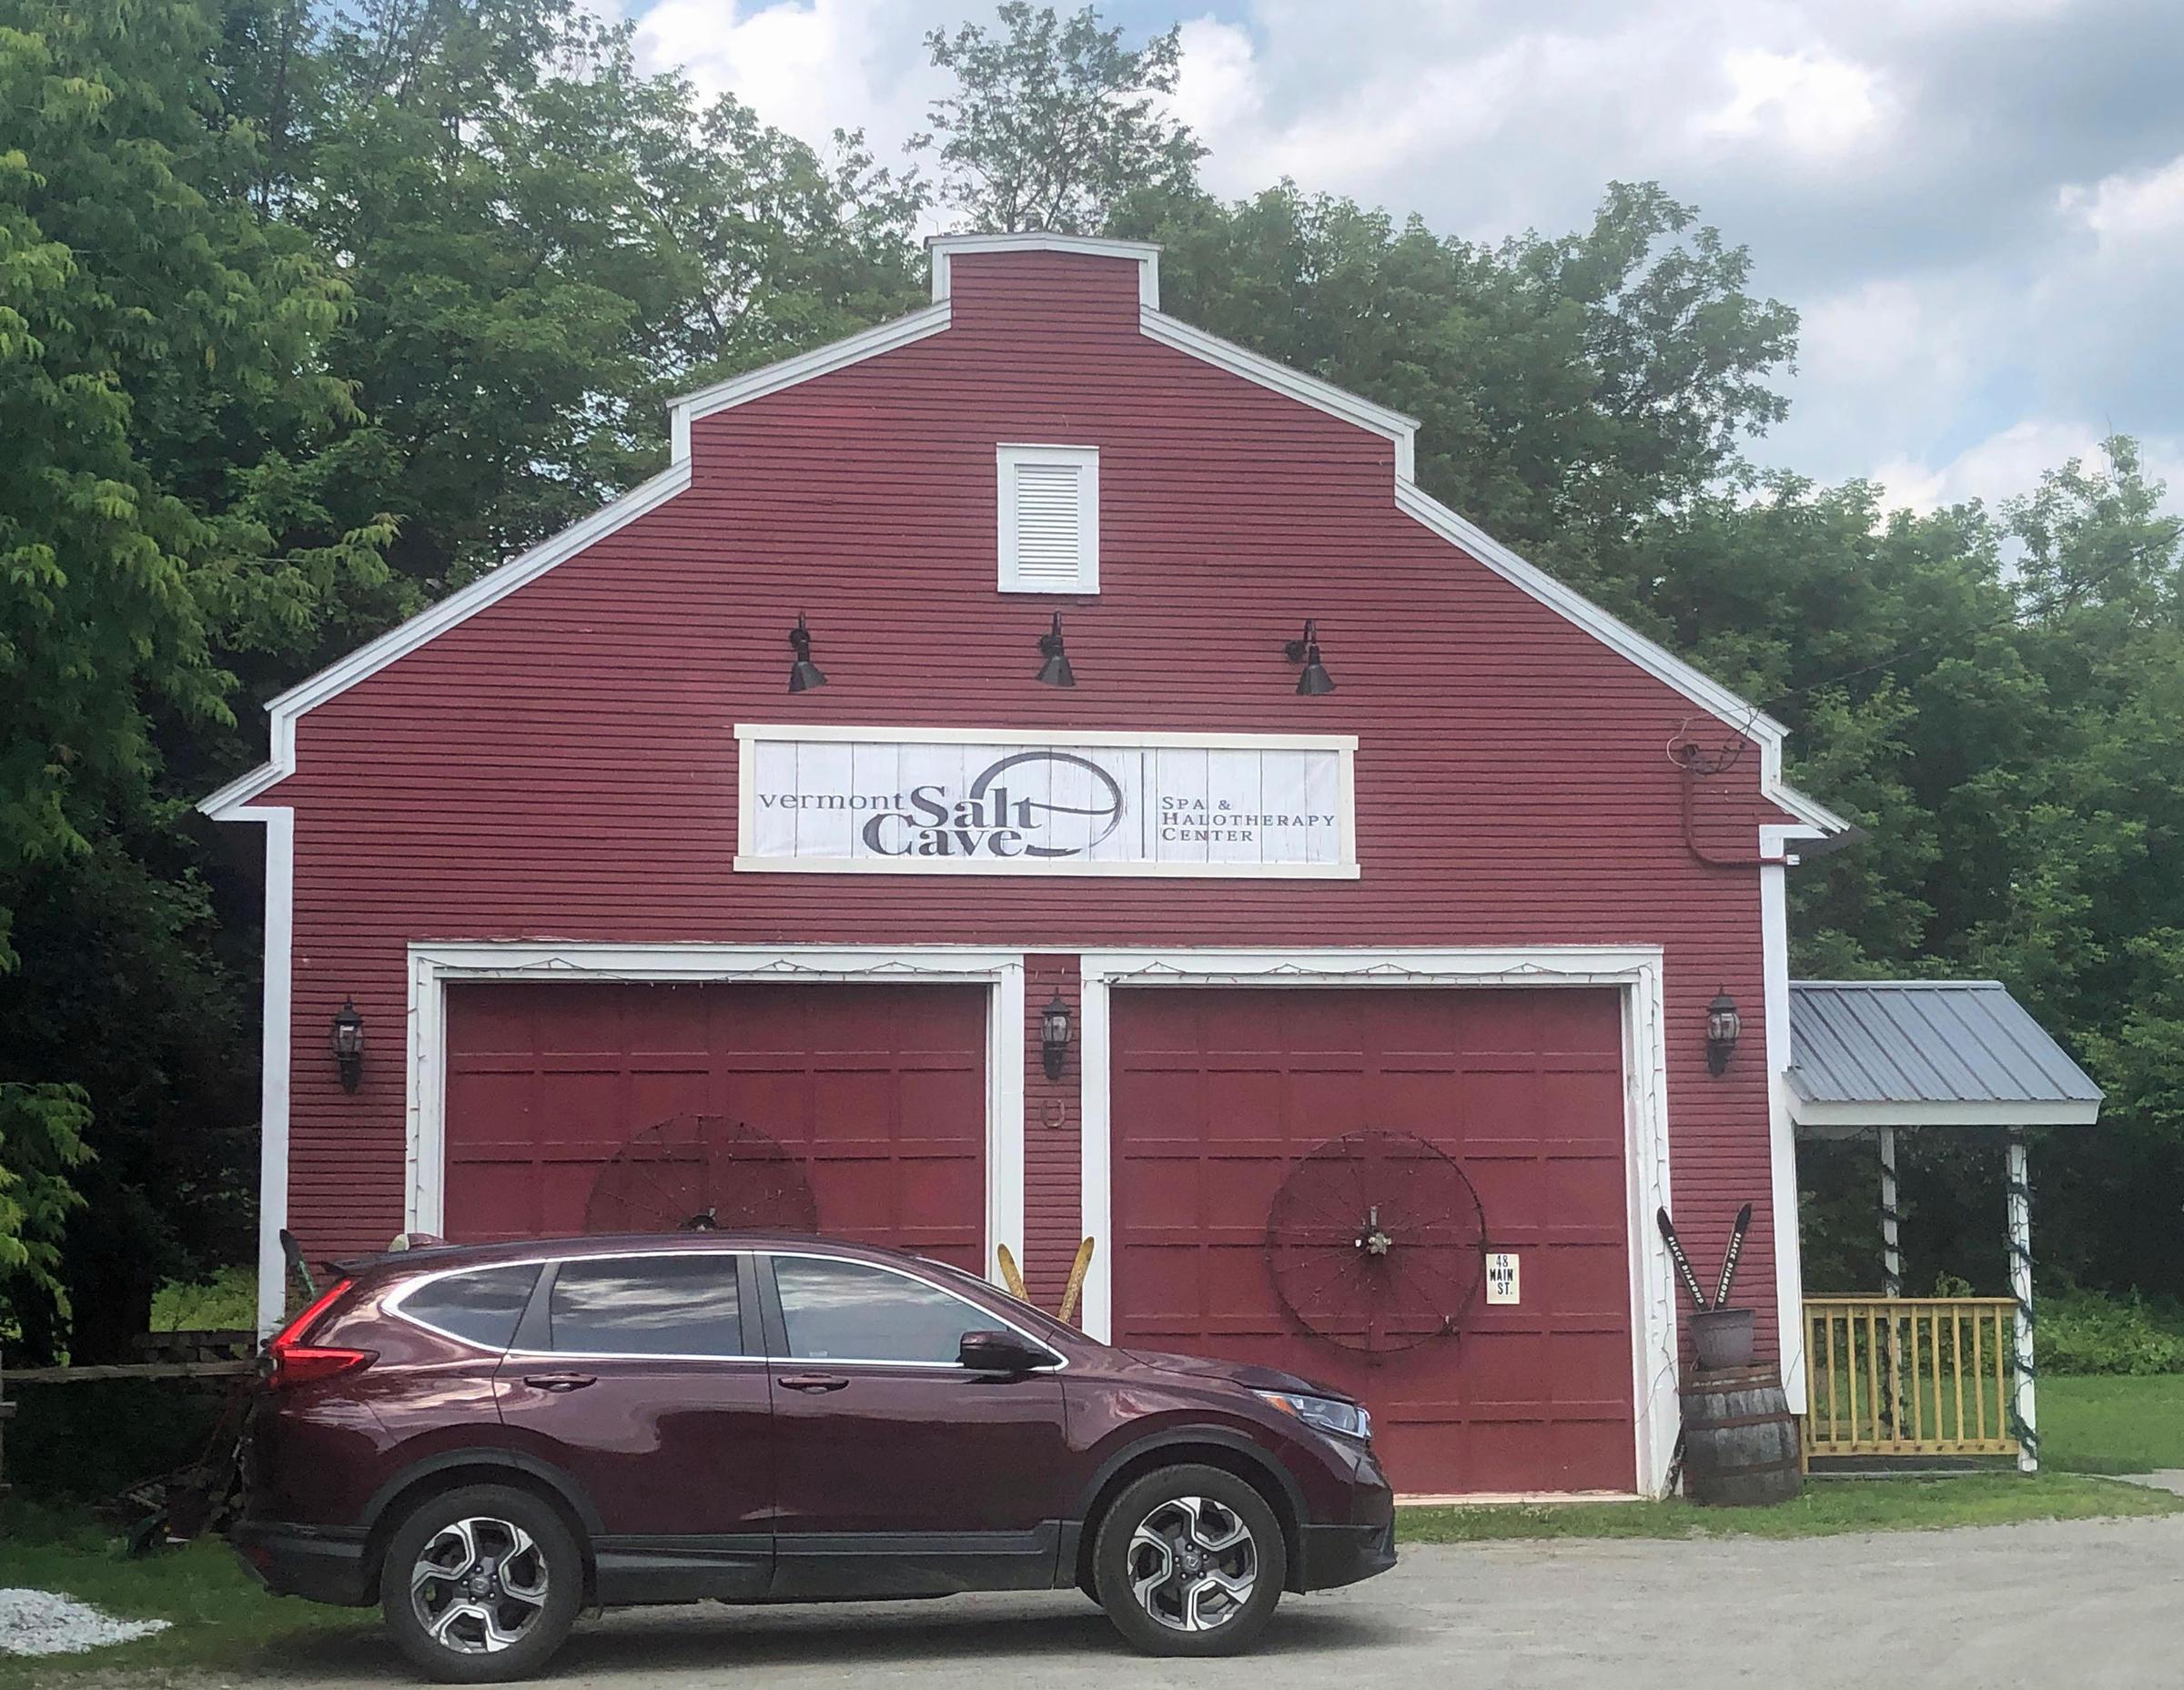 Alternative Therapy Hub Crystallizes Around Montgomery Center Salt